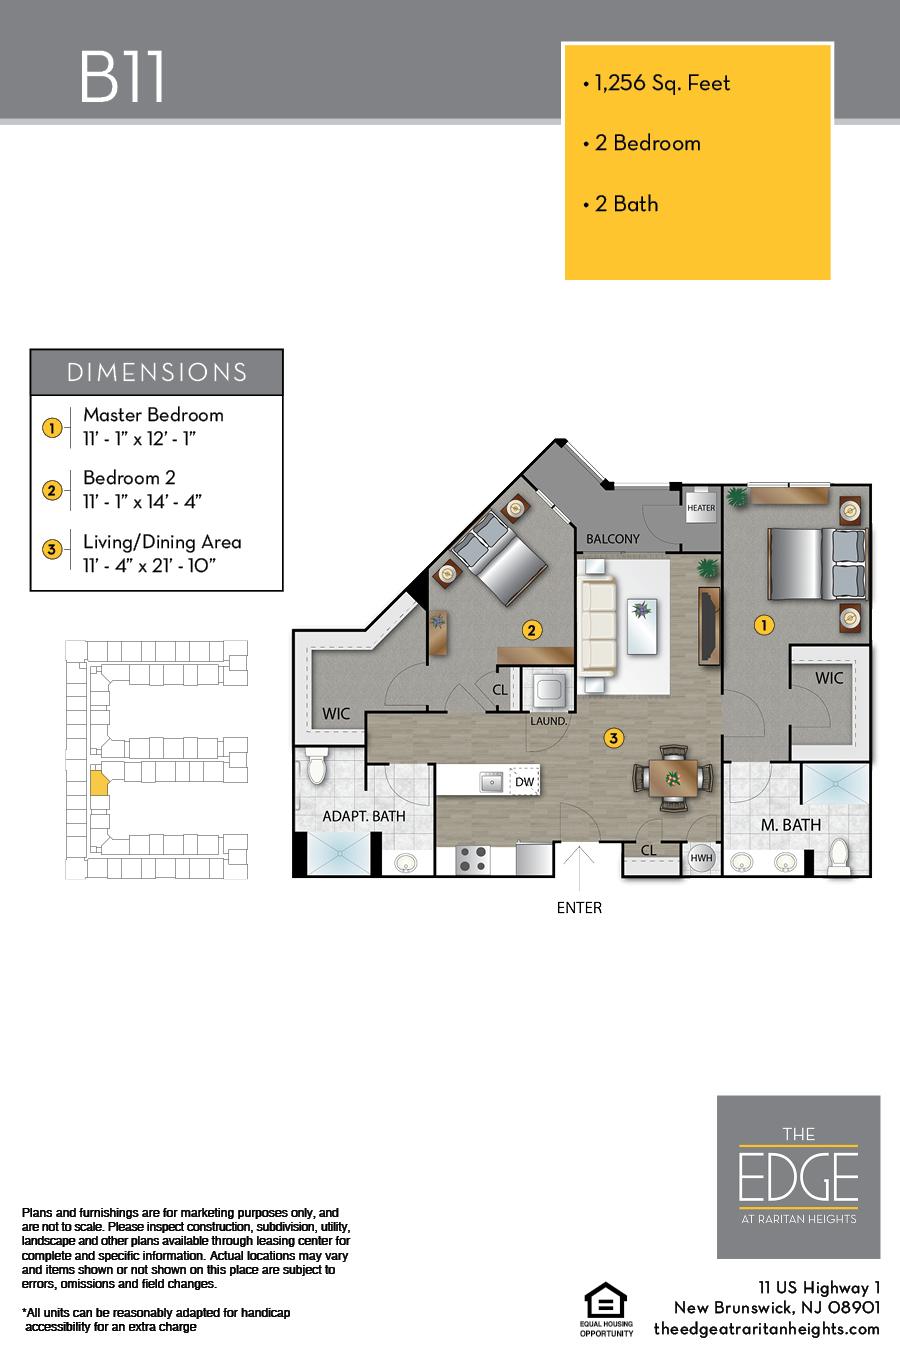 The Edge At Raritan Heights Apartment Floor Plan B11